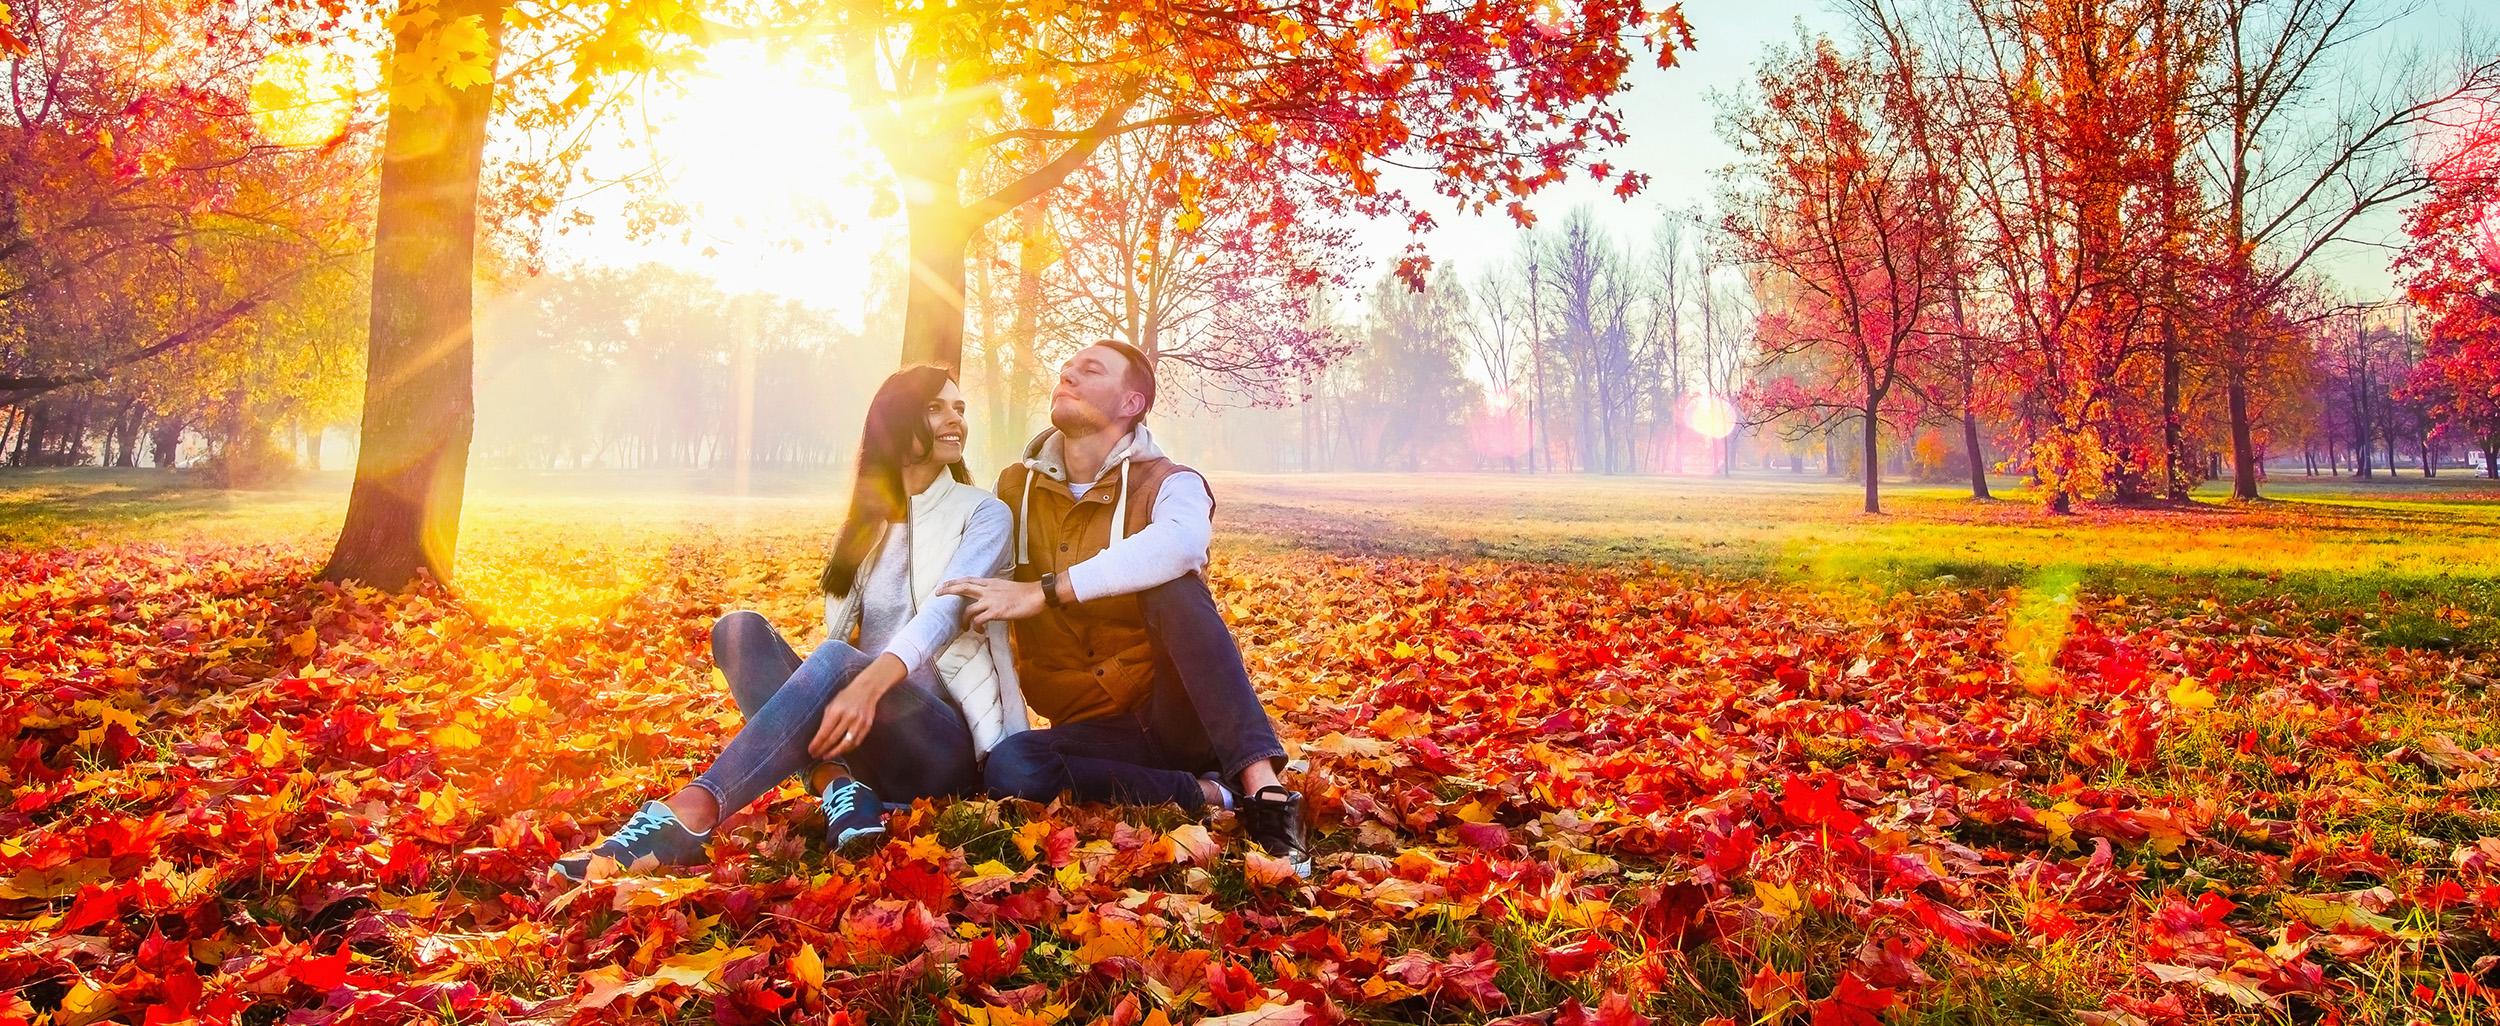 6 Pure Hotels for Enjoying Fall Foliage